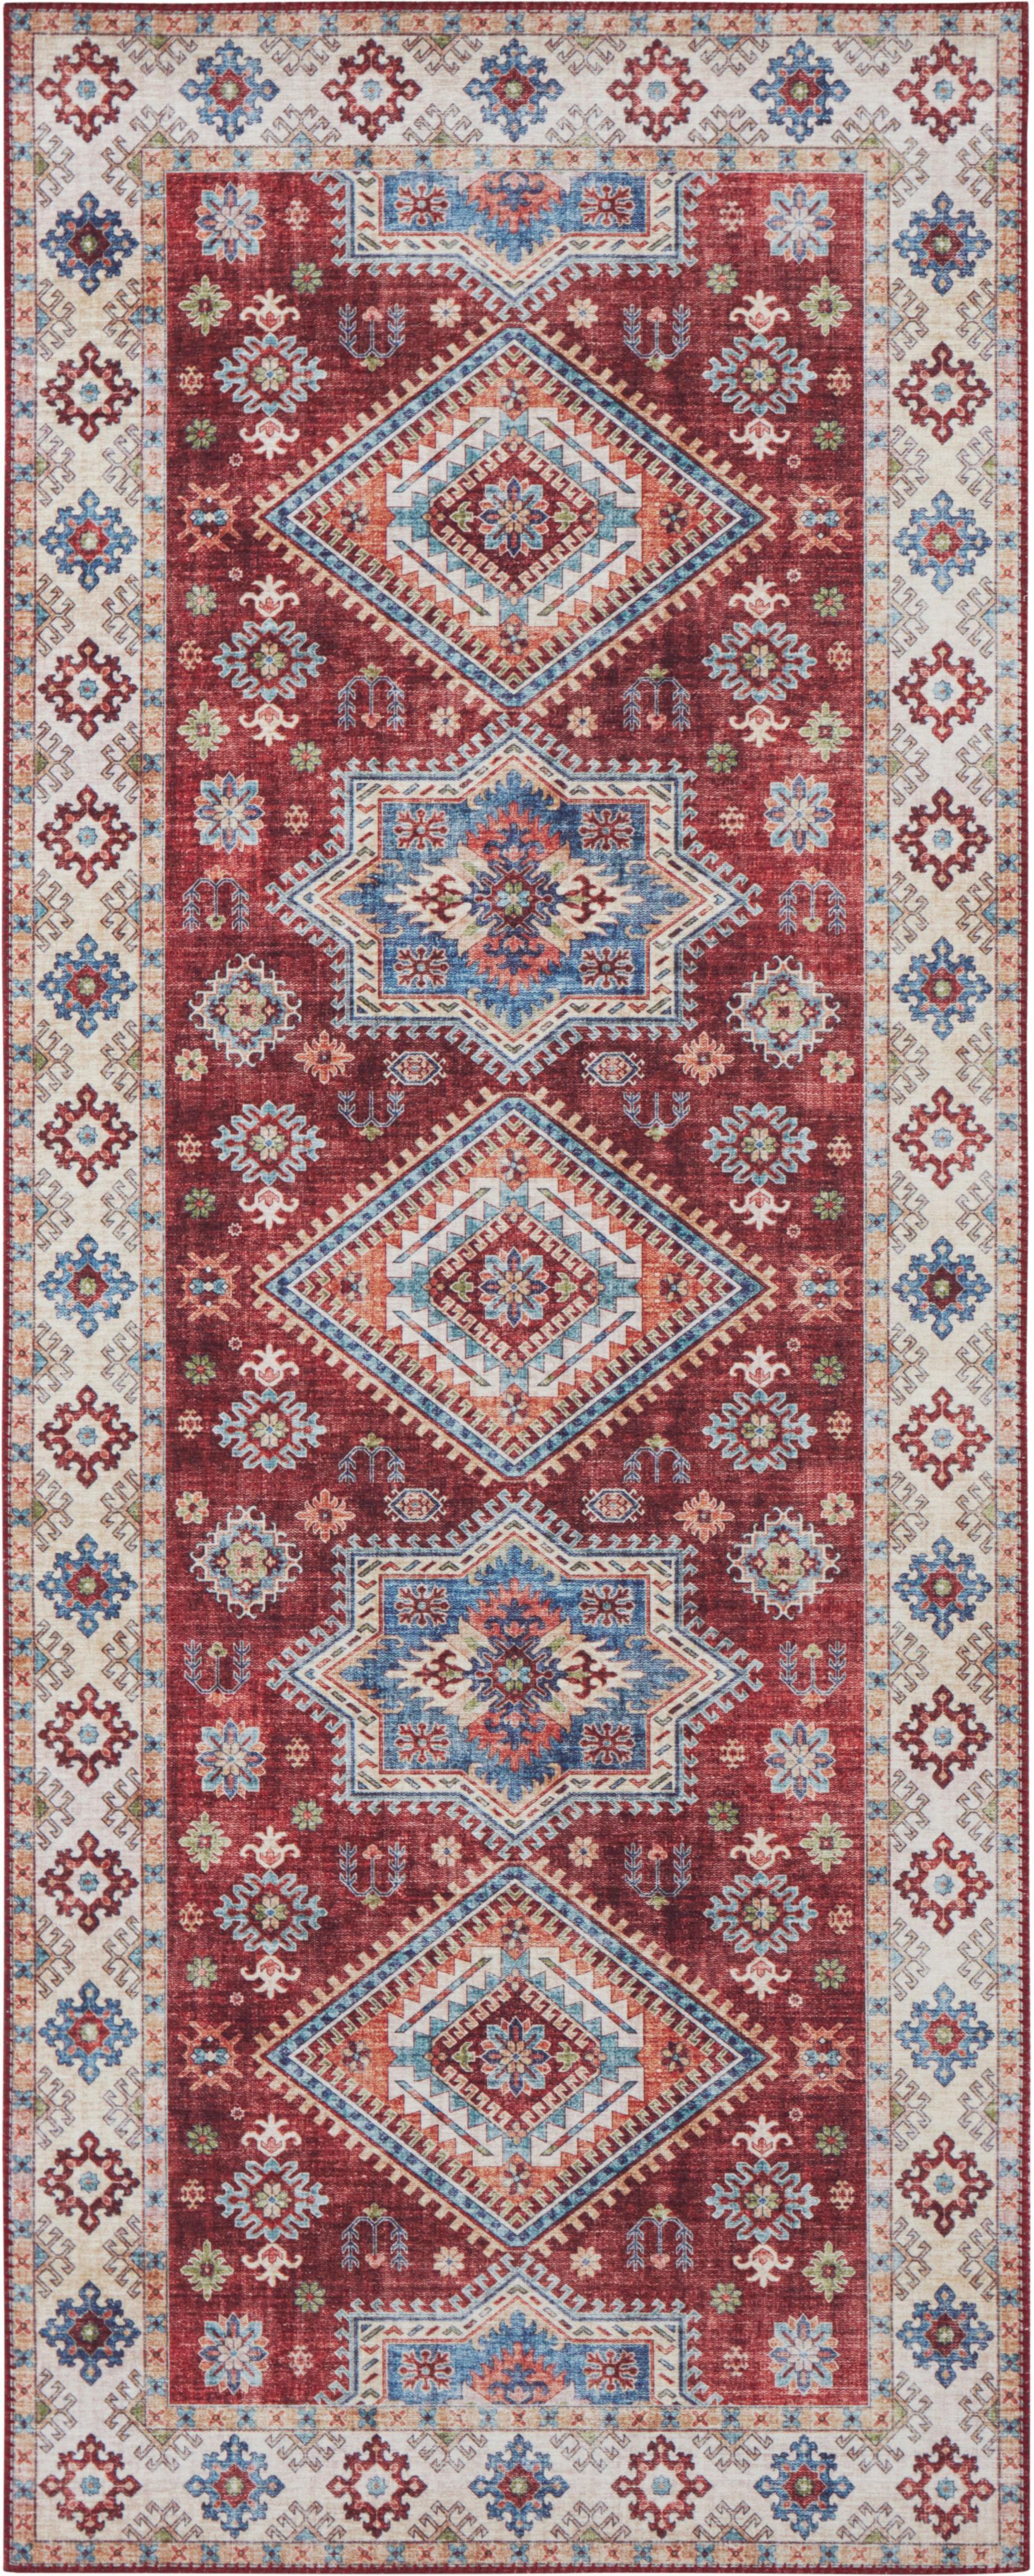 Läufer Gratia im Vintage Style, Rubinrot, Blau, 80 x 200 cm